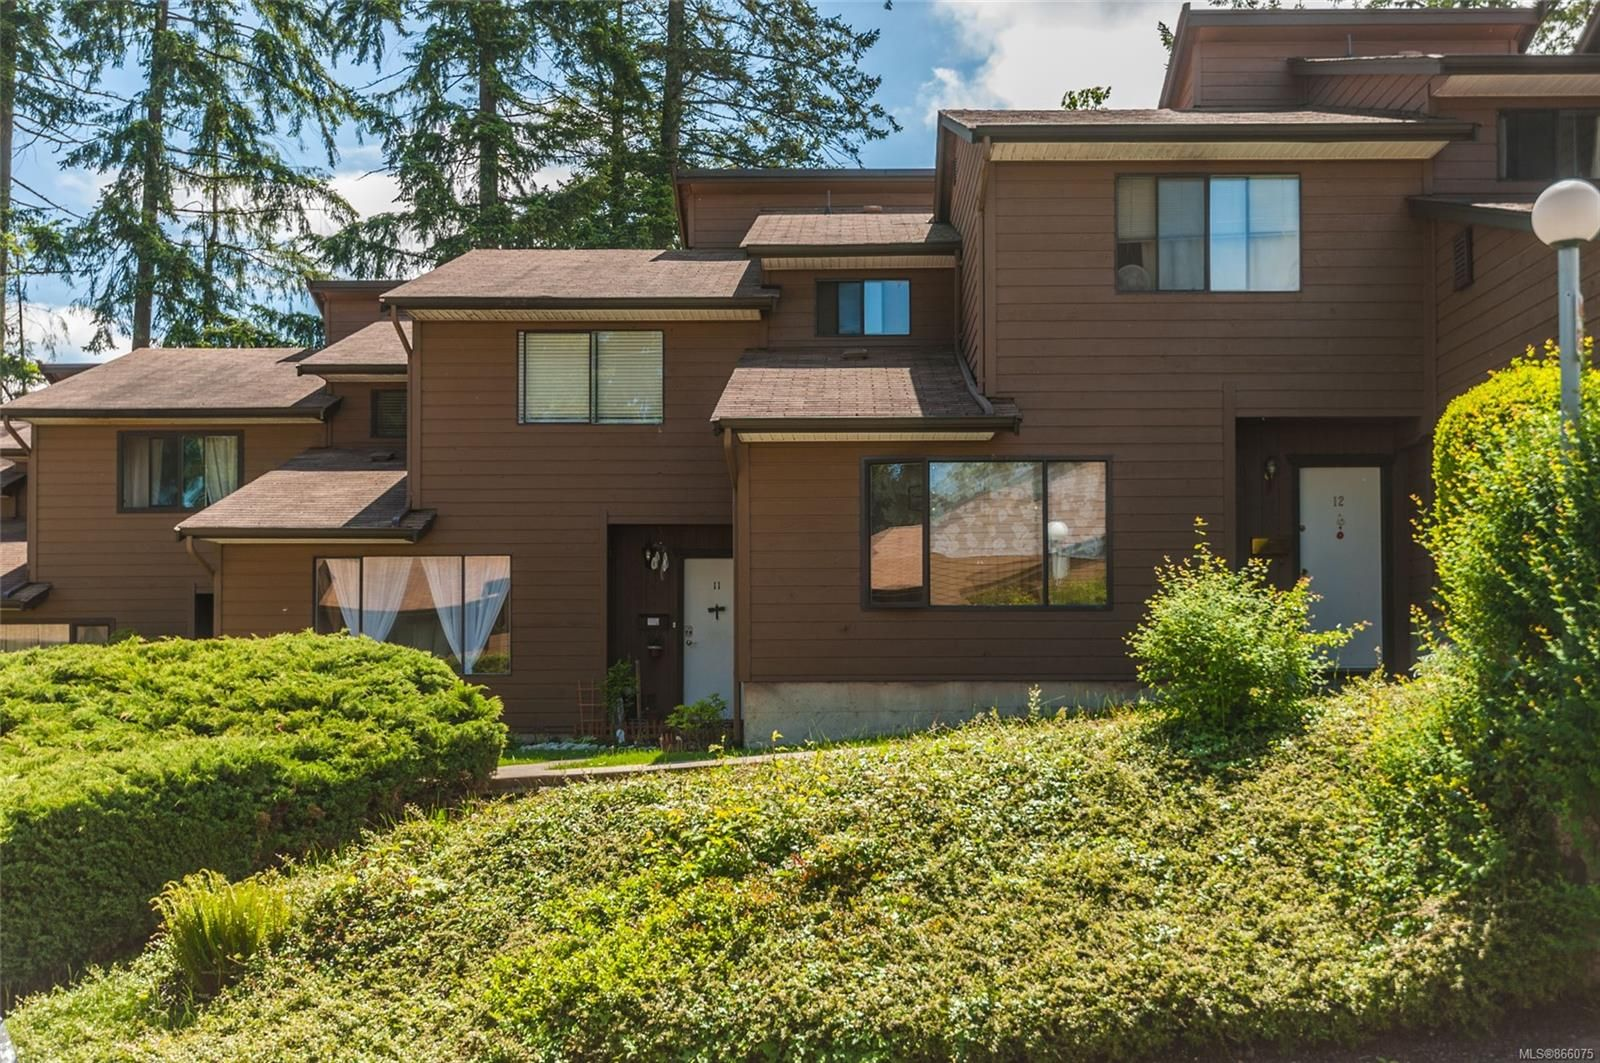 Main Photo: 11 855 Howard Ave in : Na South Nanaimo Row/Townhouse for sale (Nanaimo)  : MLS®# 866075